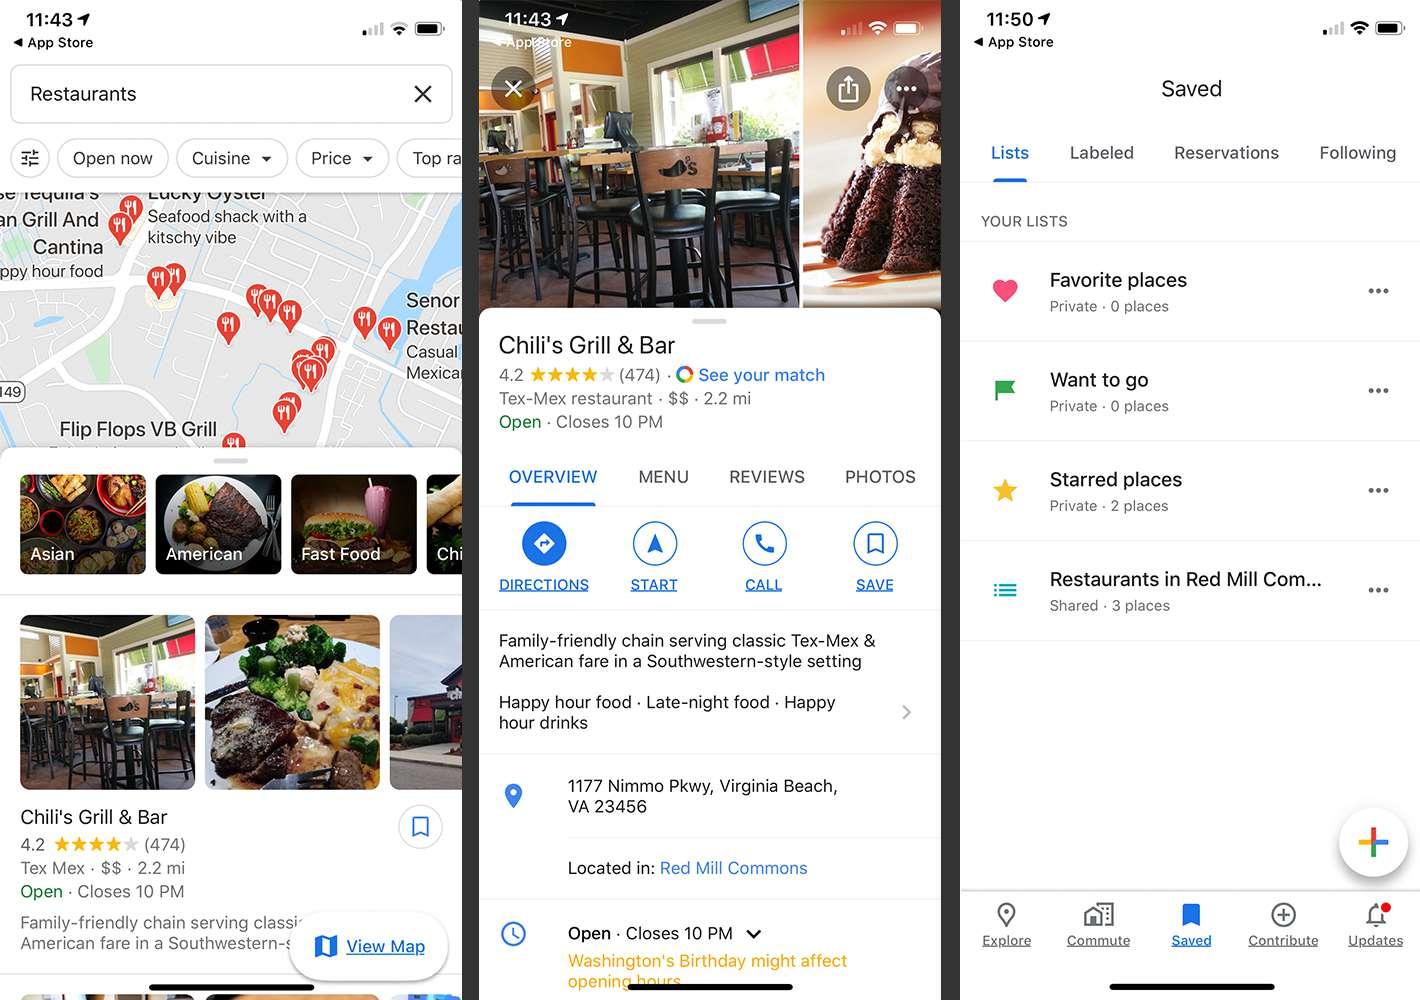 Google Maps app showing restaurants